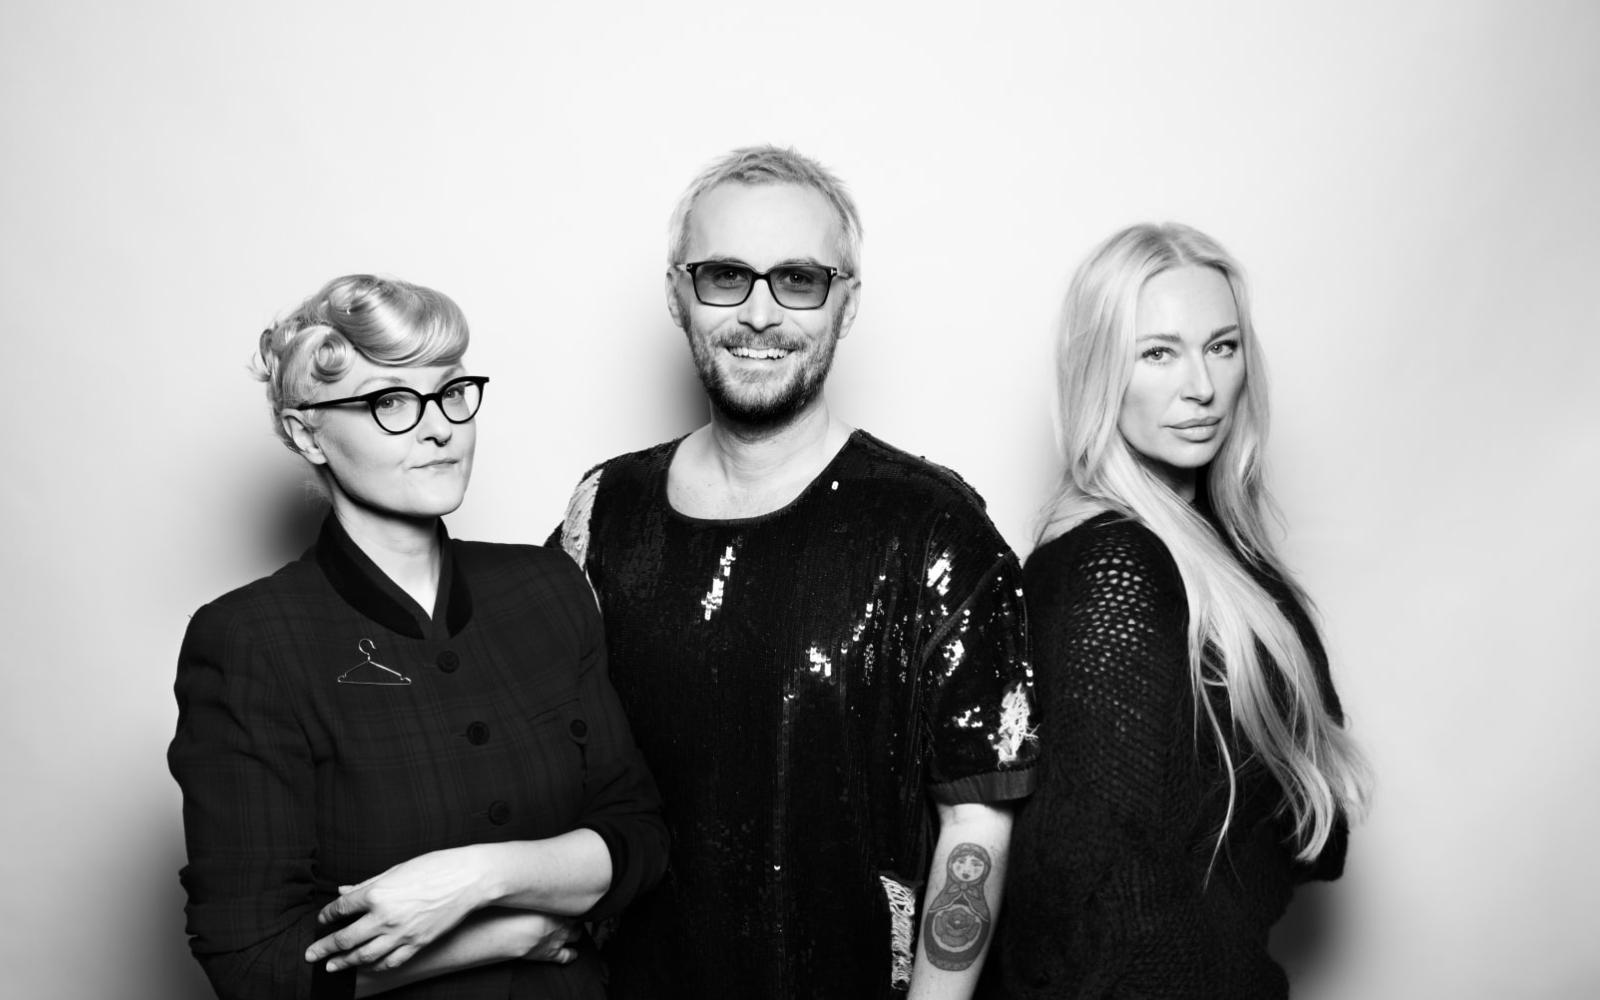 Kreatörerna Bea Szenfeld, Fredrik Robertsson och Isabel Adrian. Foto: Pressbild.